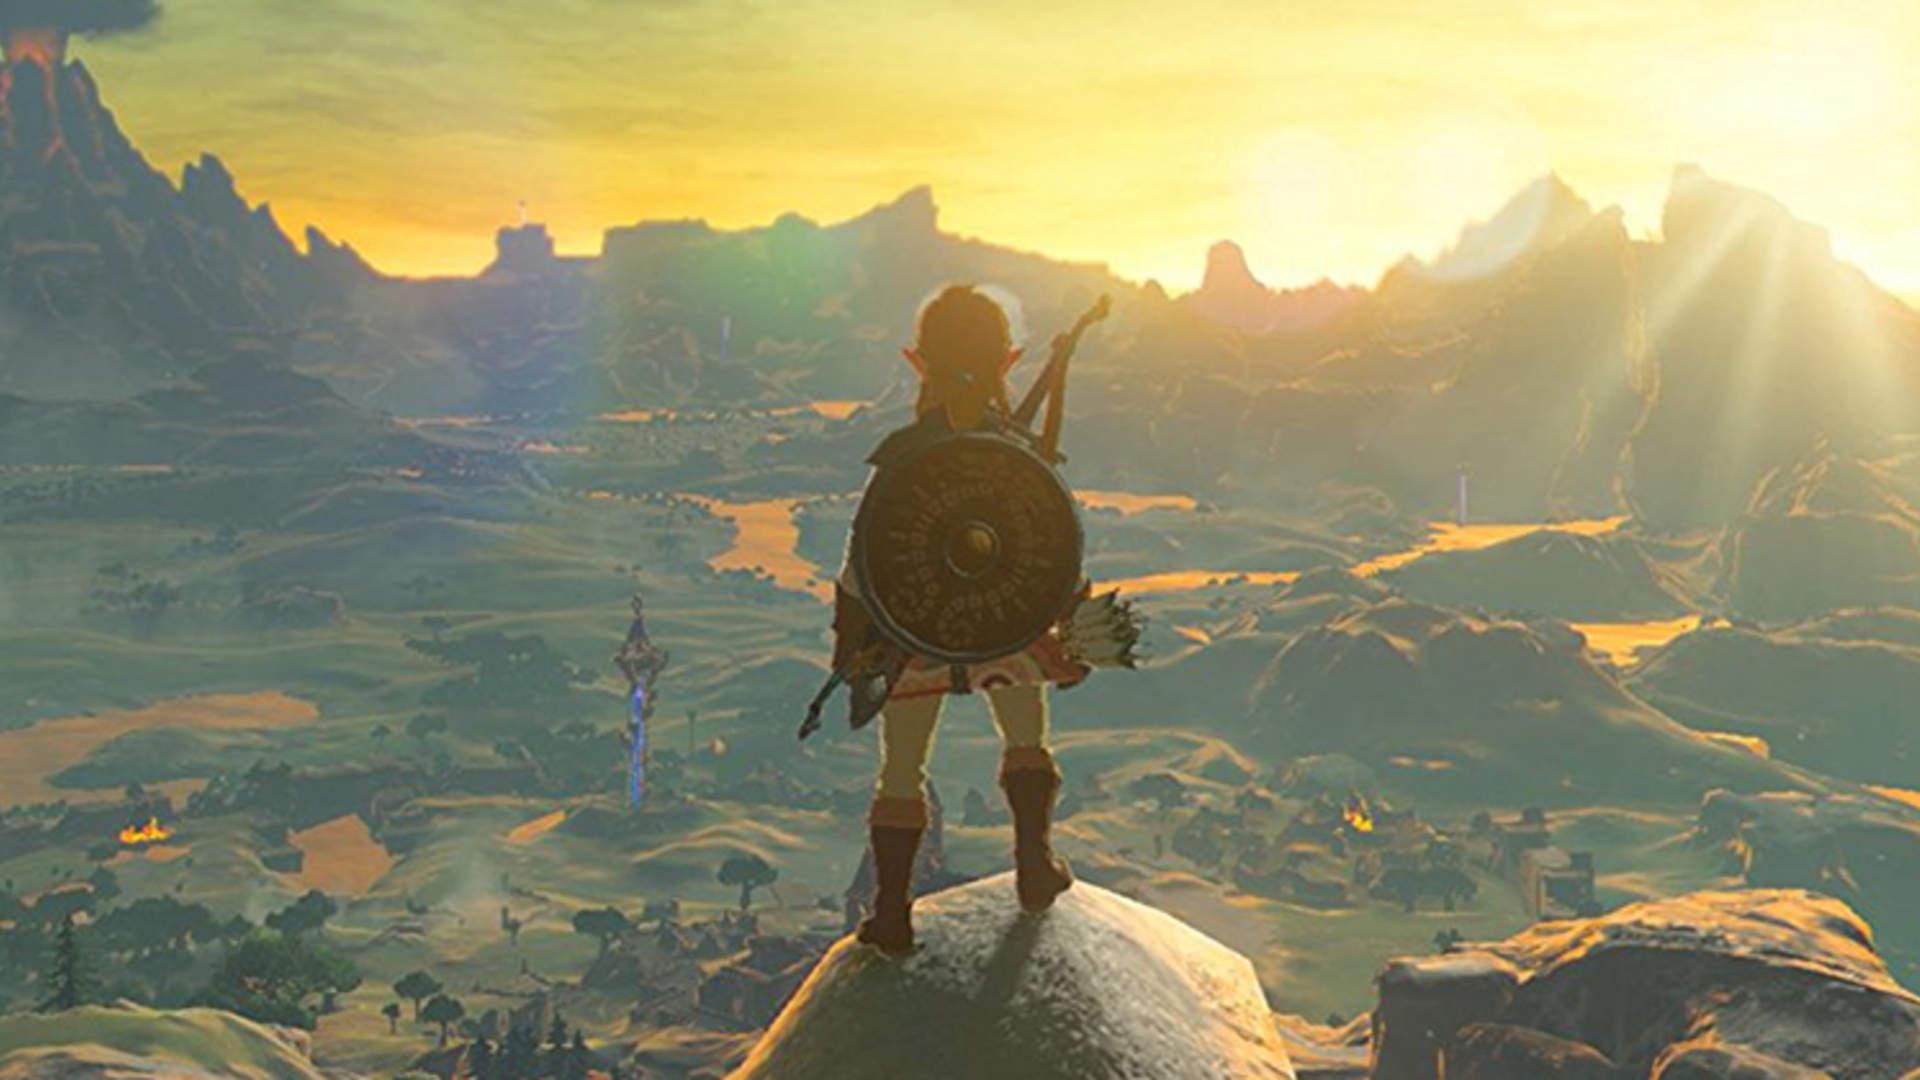 longest video games - breath of the wild animal crossing - longest games san andreas screenshot